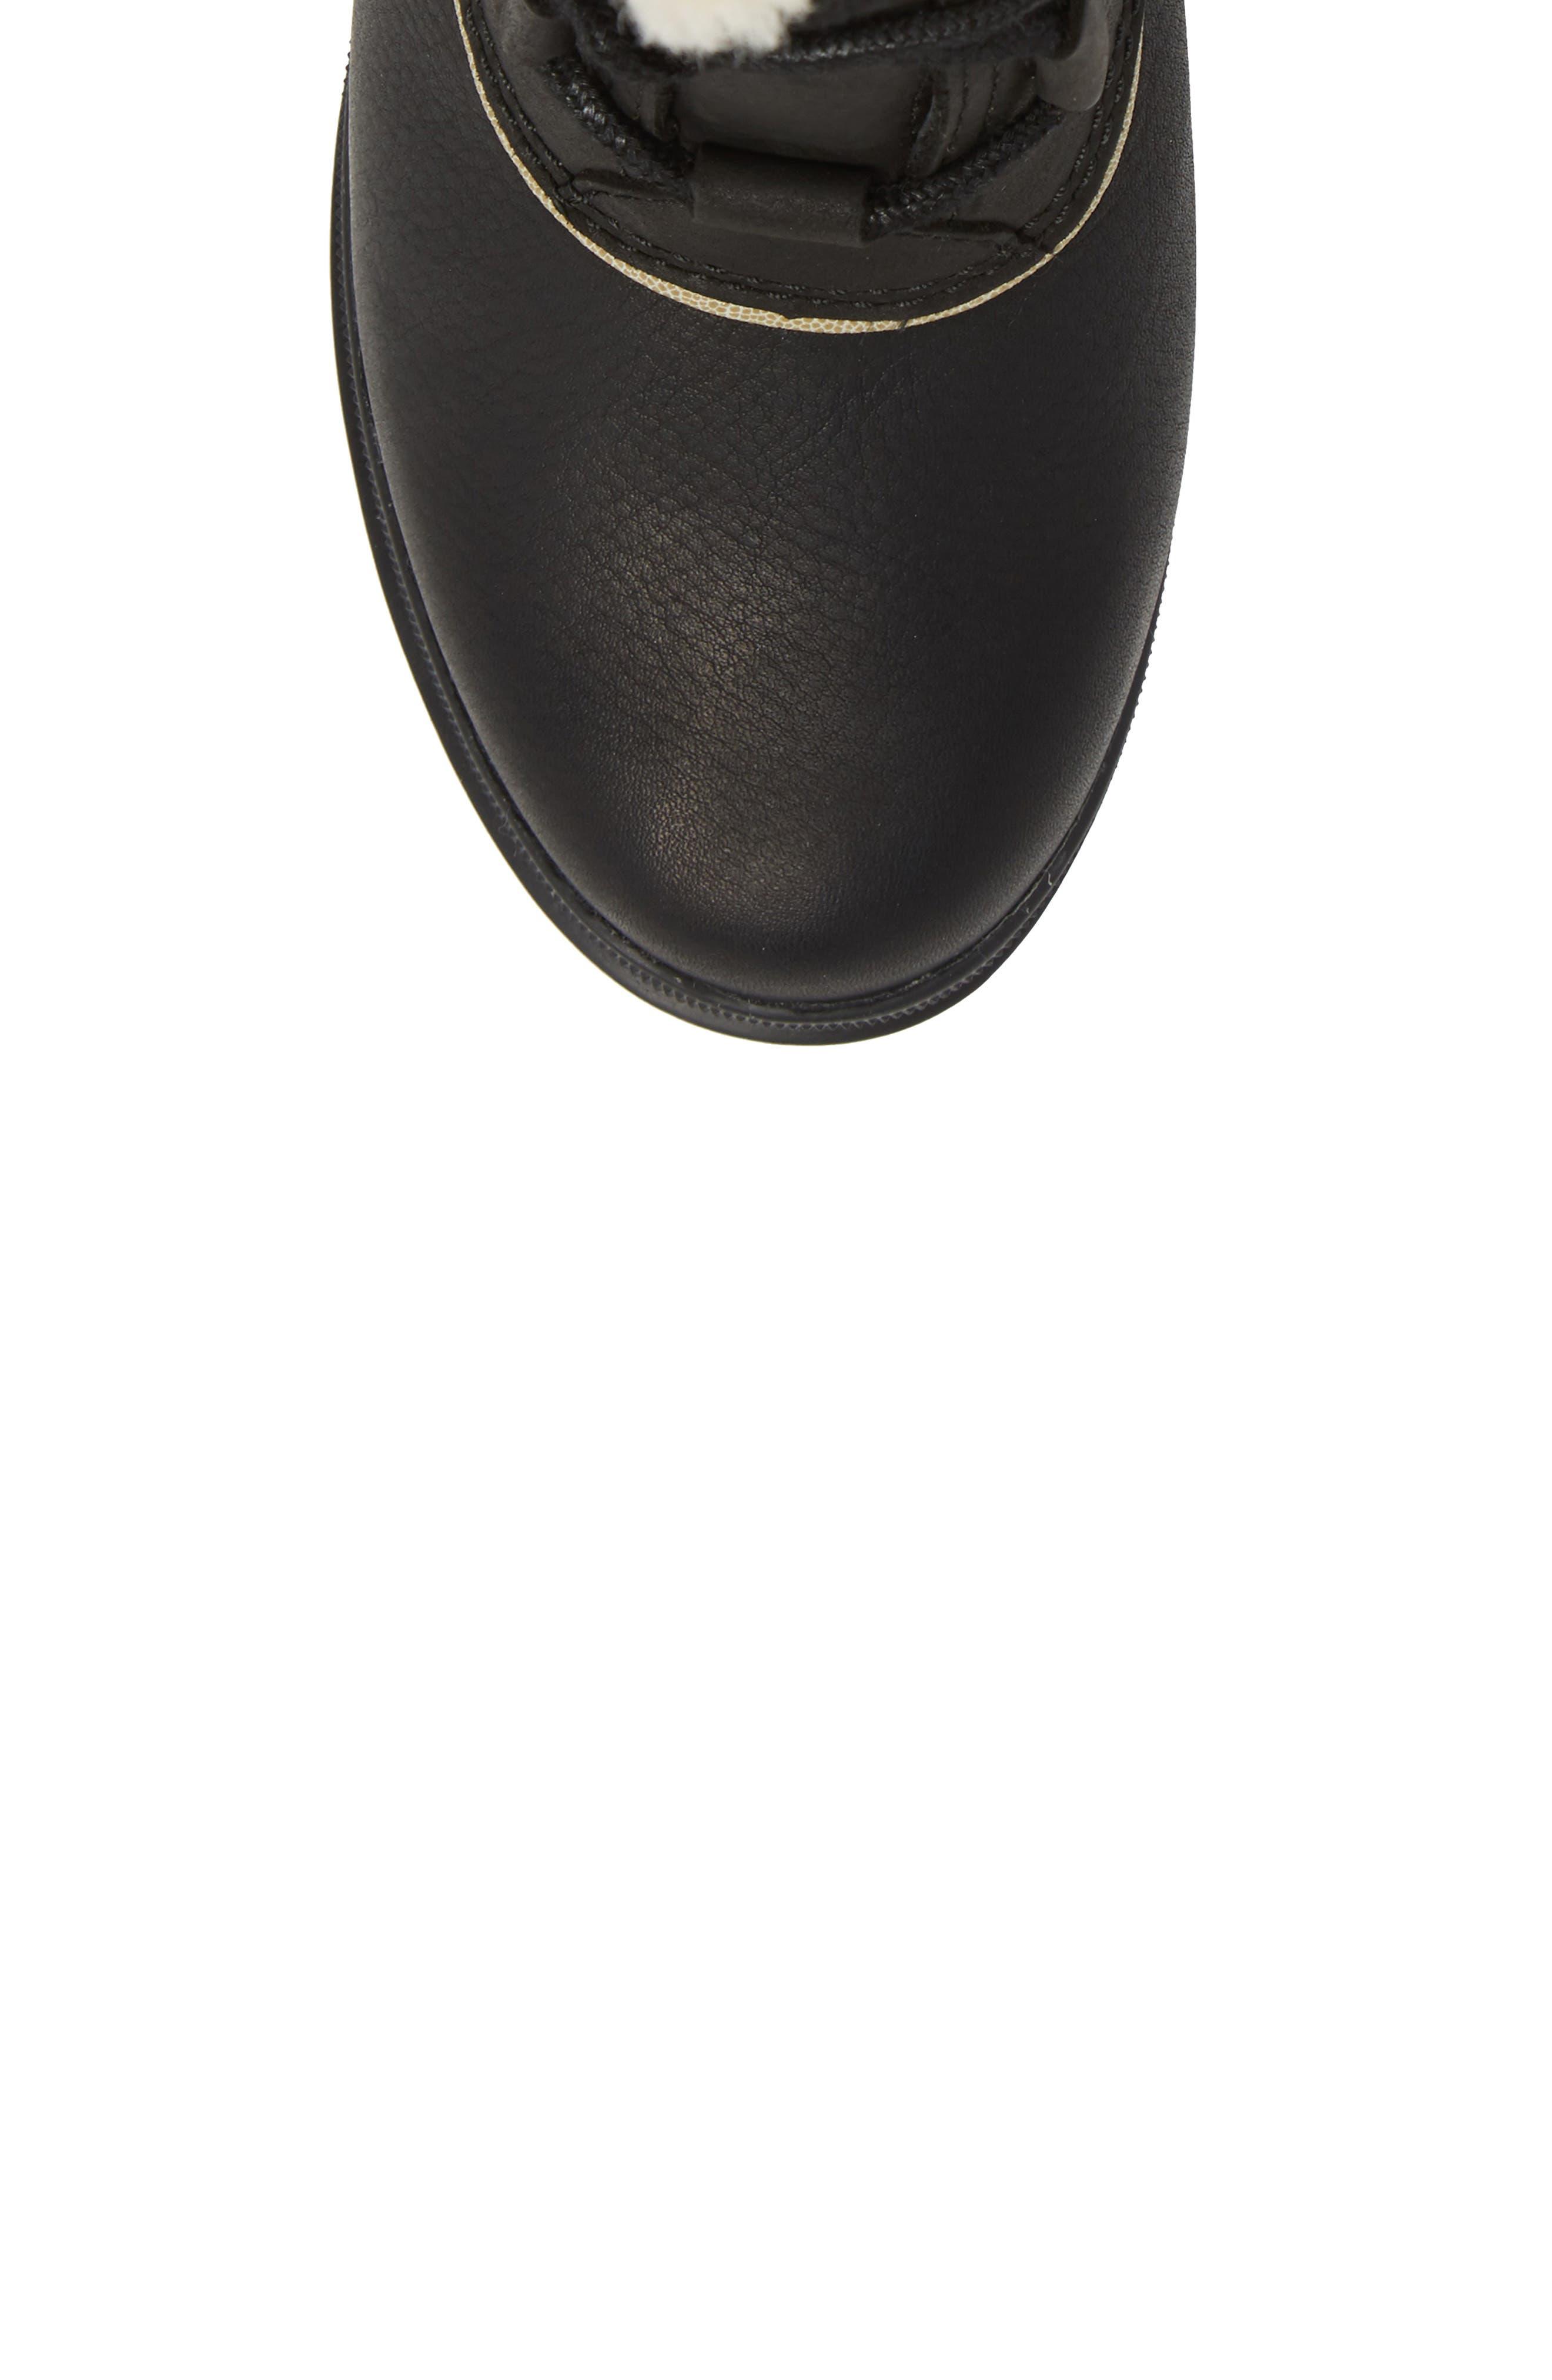 SOREL,                             Dacie Genuine Shearling Cuff Waterproof Boot,                             Alternate thumbnail 5, color,                             010